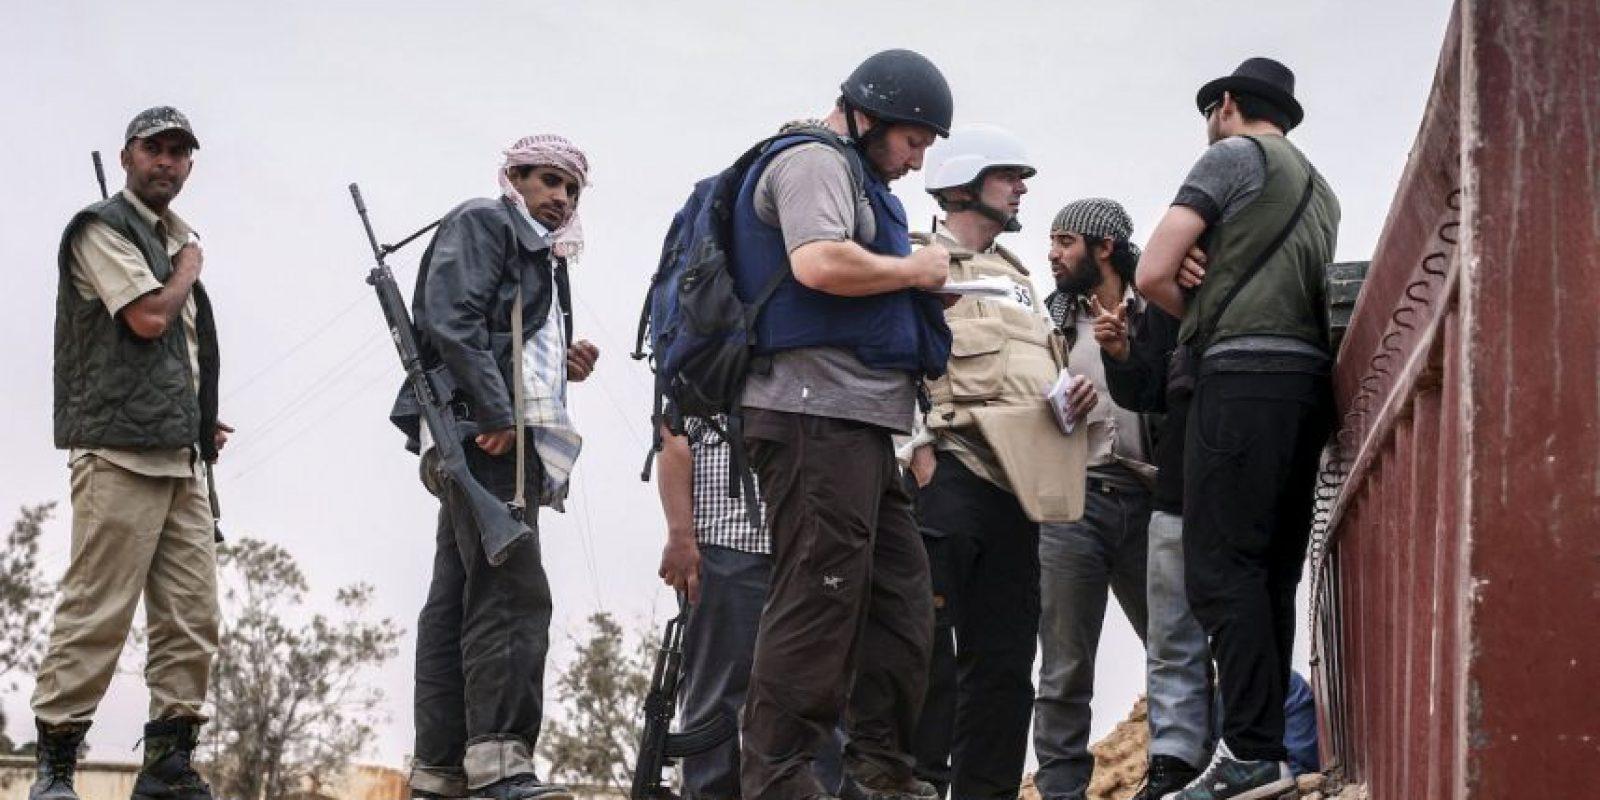 Steven Sotloff, periodista asesinado por ISIS. Foto:Getty